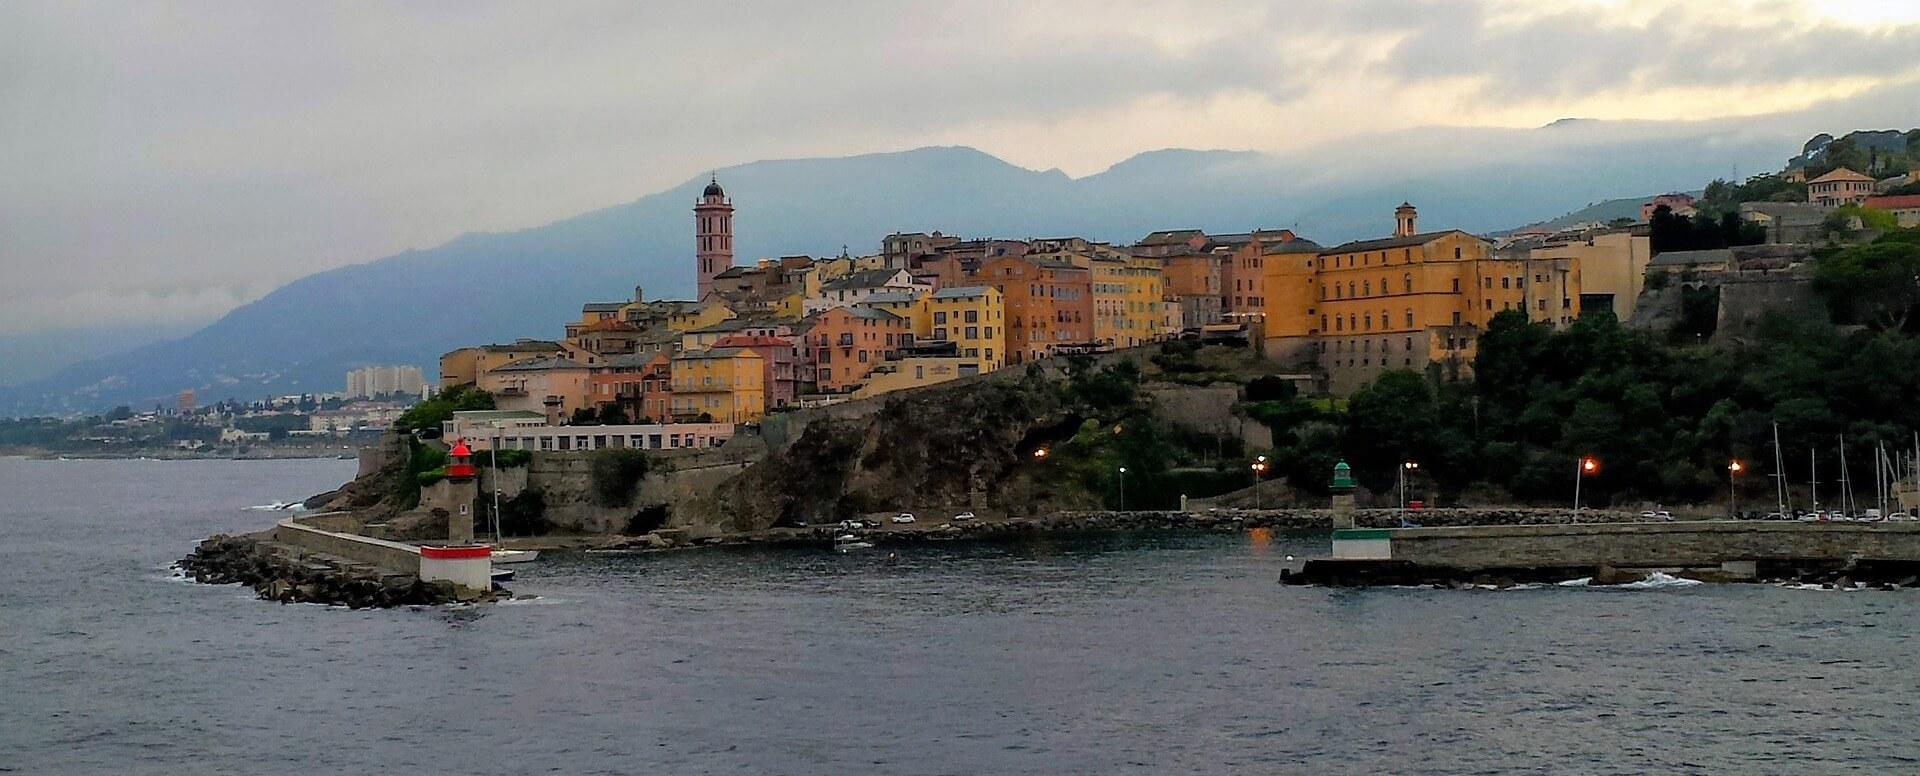 2. Visiter l'impressionnante citadelle génoise de Porto-Vecchio - Corse